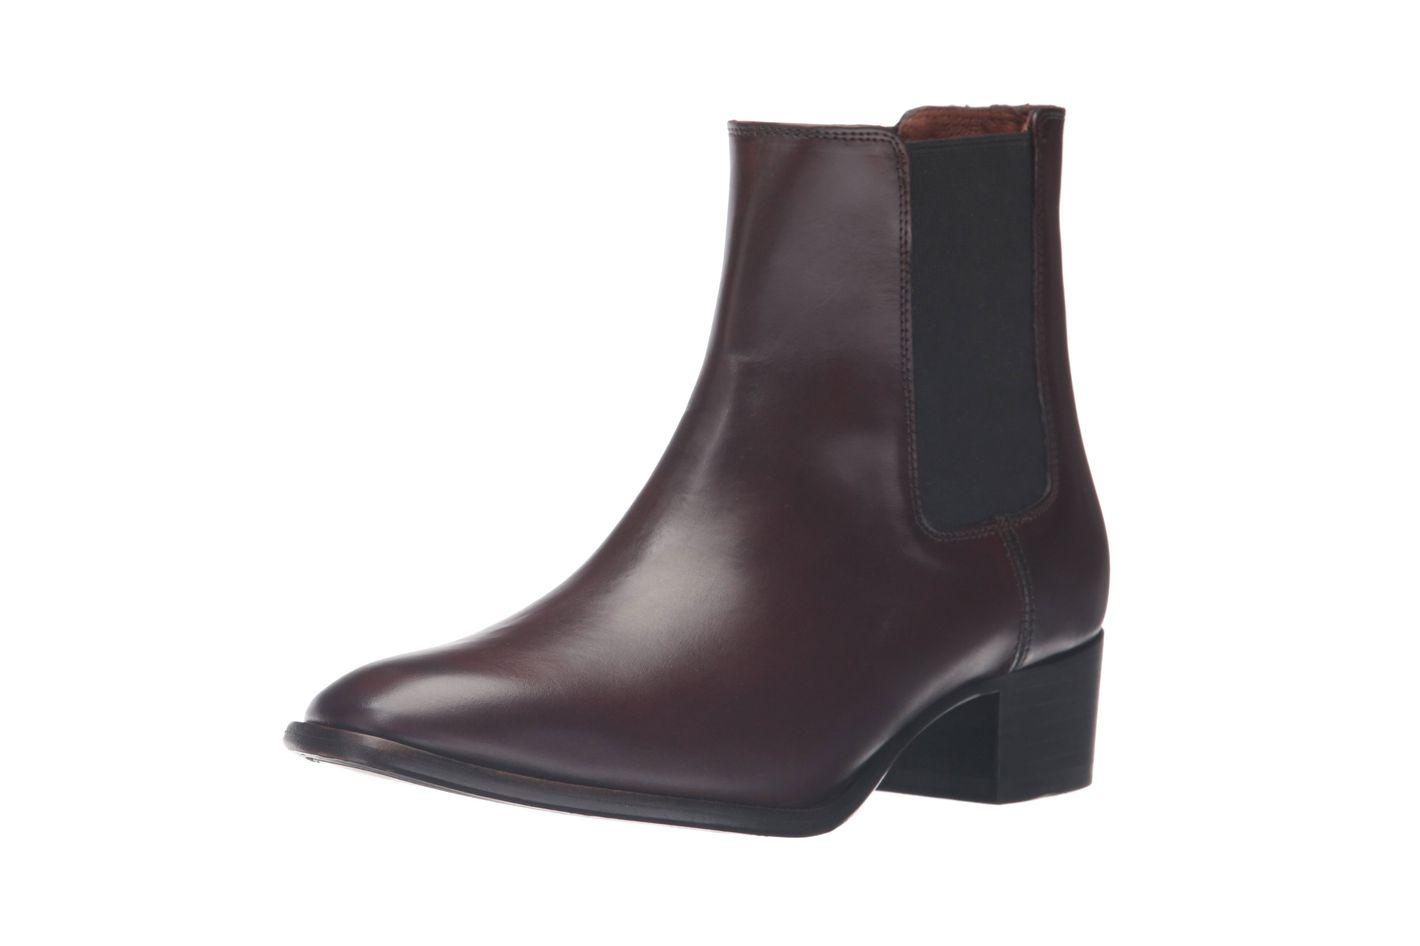 Frye Women's Dara Chelsea Boot